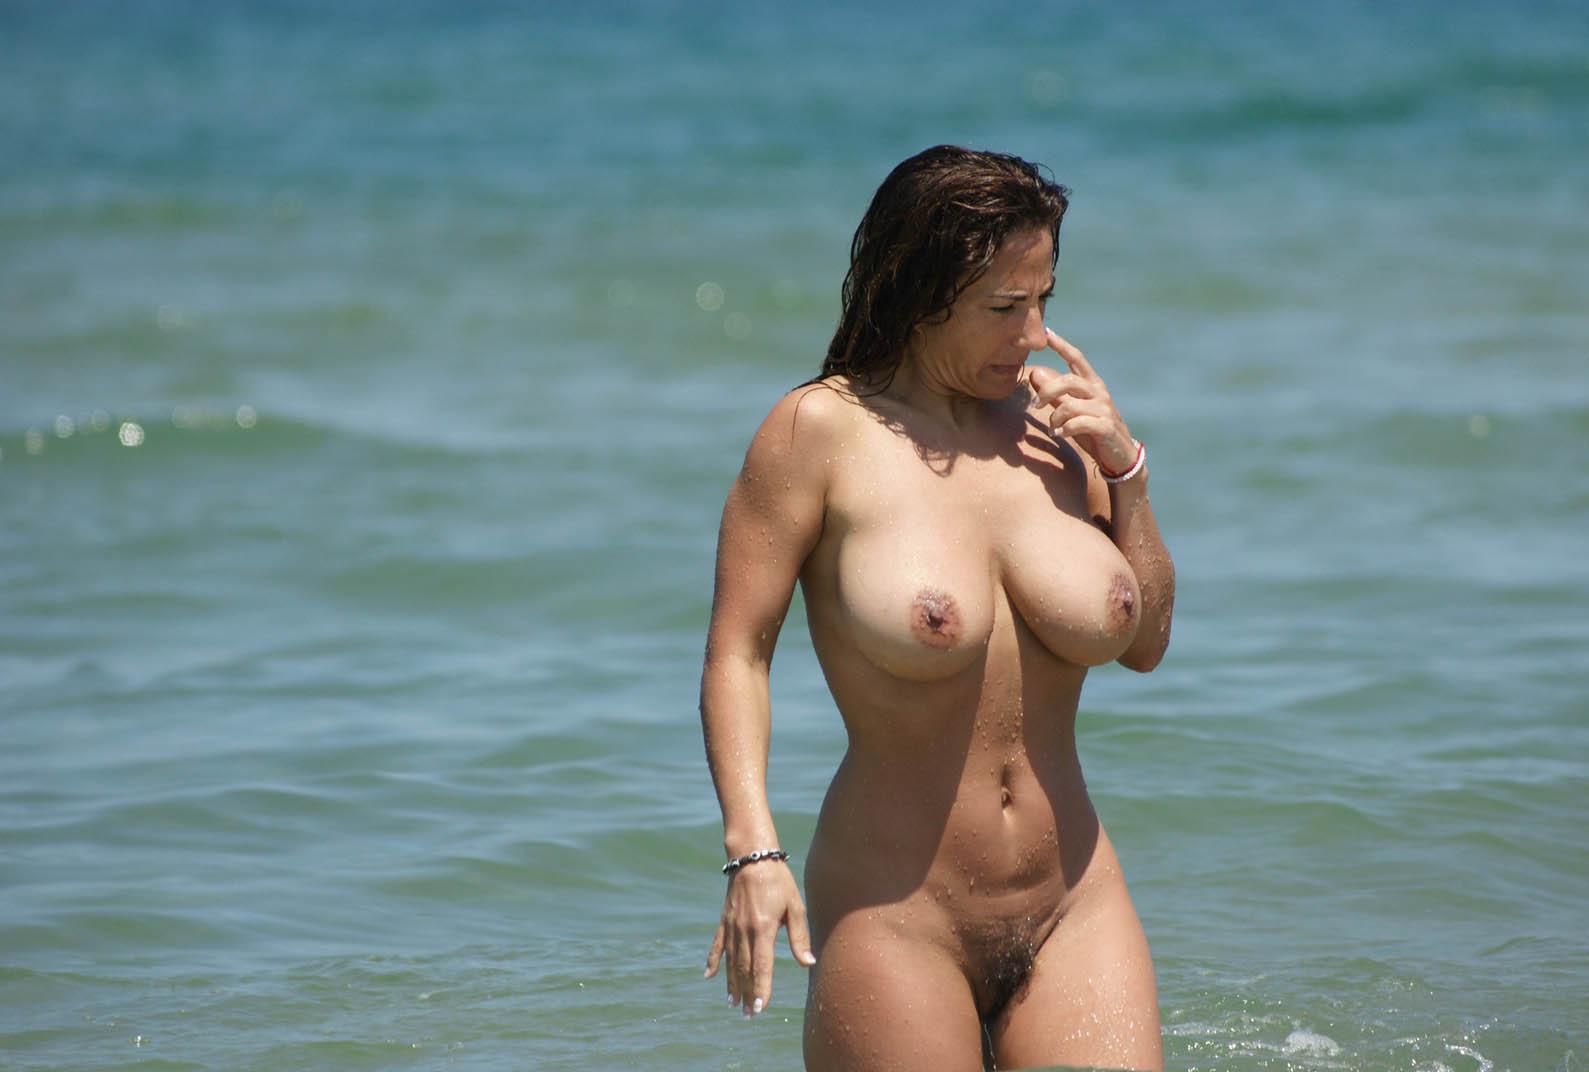 image Buxom brit sophie dee bikini tease